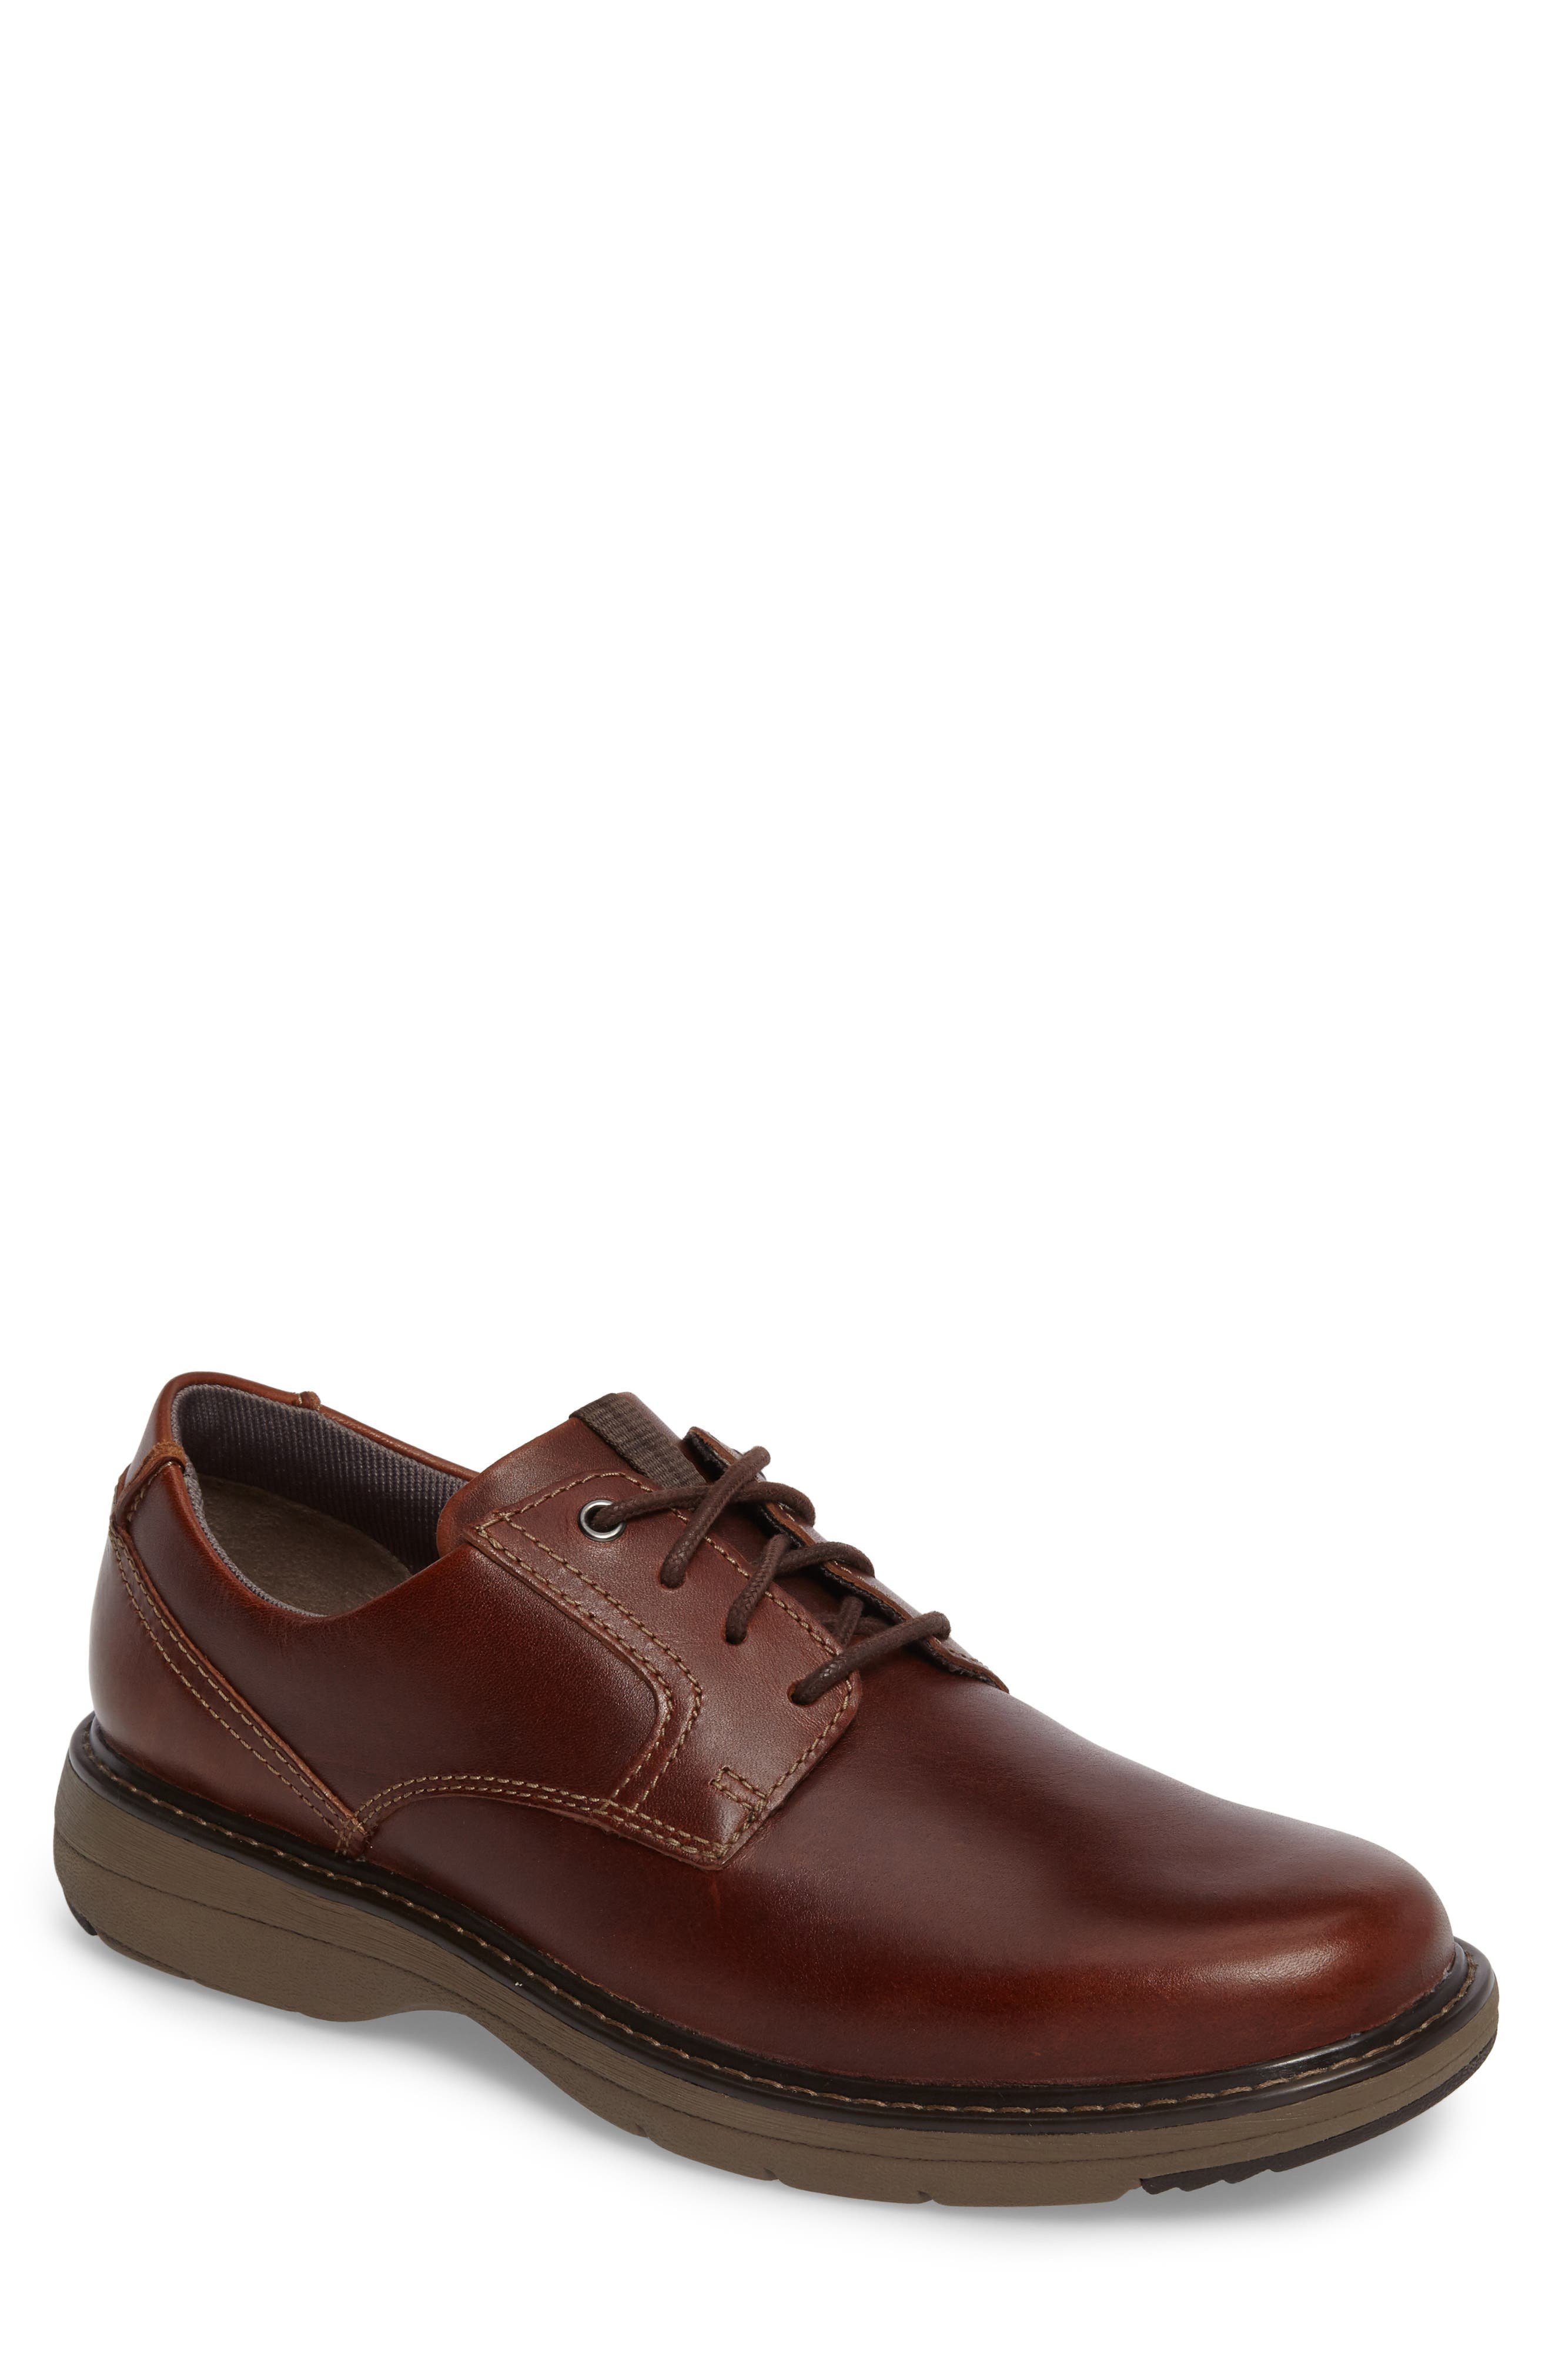 Cushox Plain Toe Derby,                             Main thumbnail 1, color,                             Dark Tan Leather